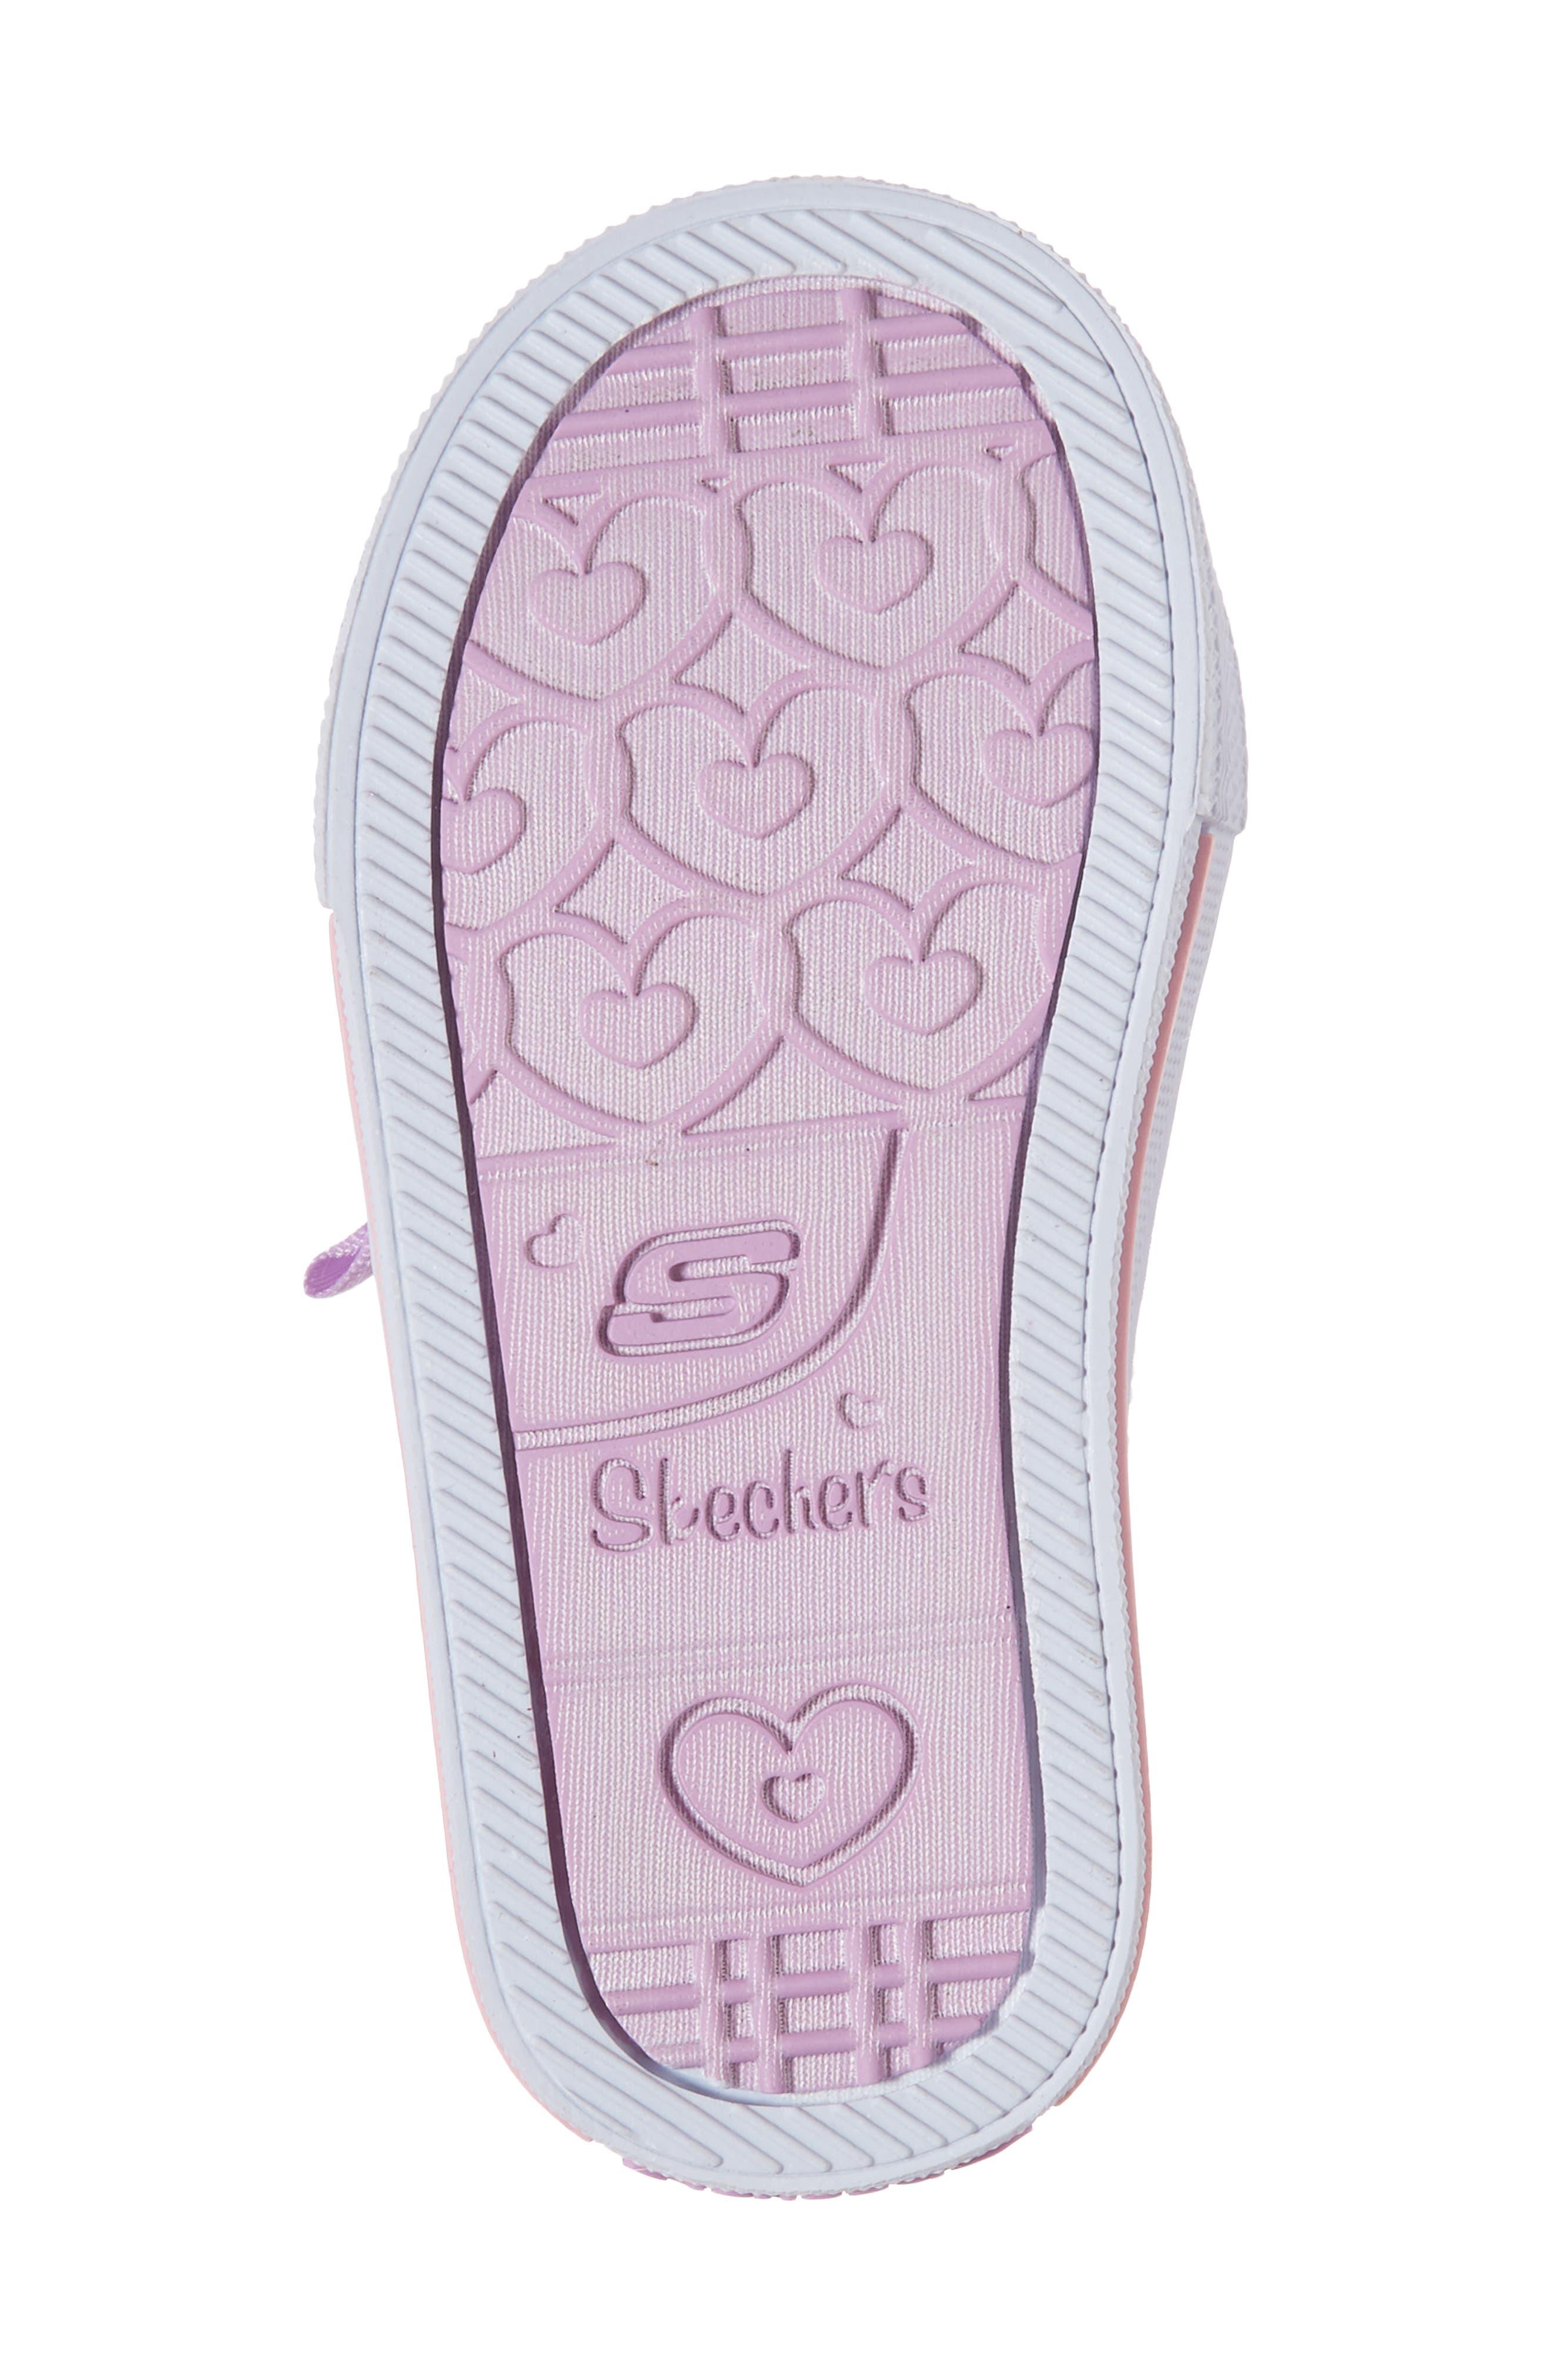 Twinkle Toes Shuffles Light-Up Glitter Sneaker,                             Alternate thumbnail 6, color,                             White/ Silver/ Light Pink